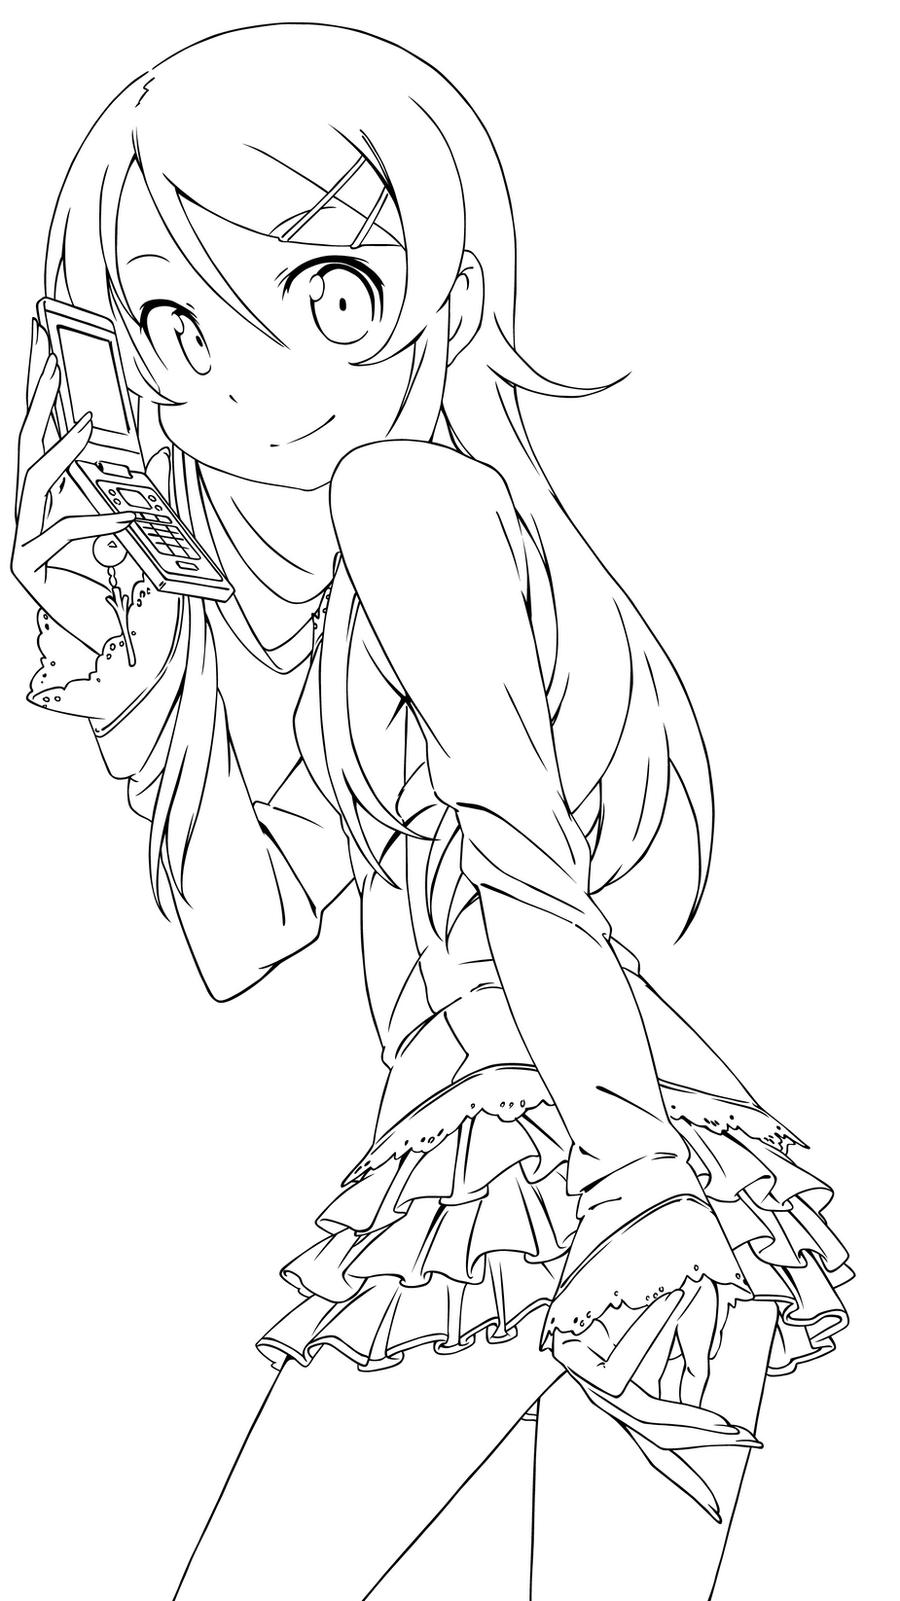 Coloring Lineart : Kirino kousaka lineart by mayuuki chan on deviantart